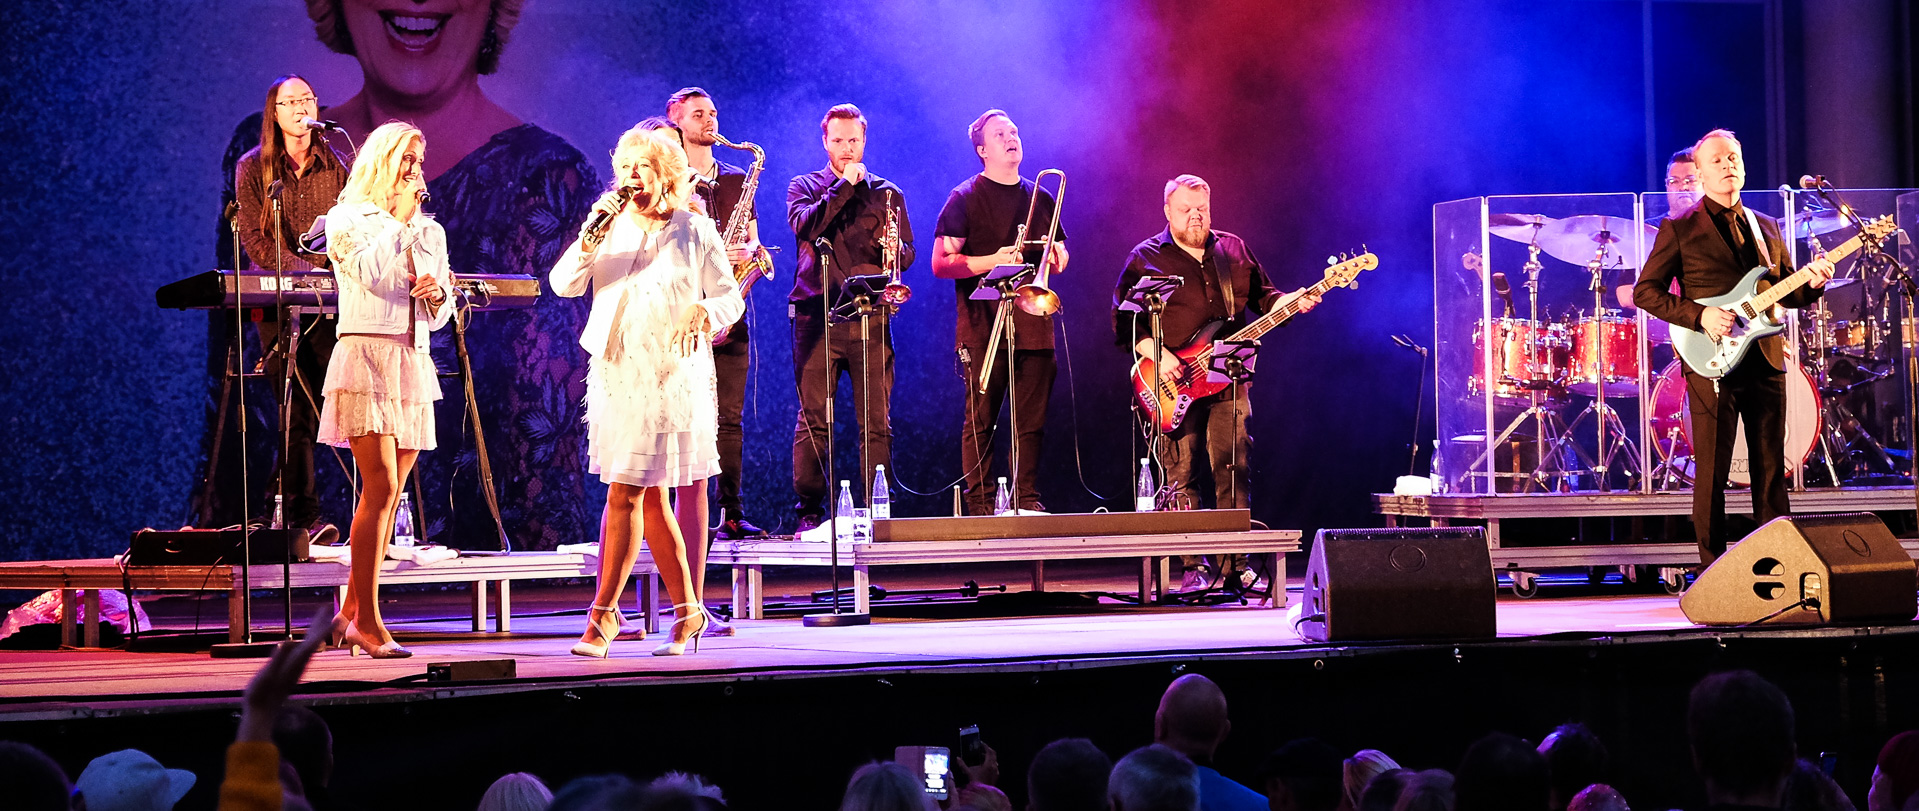 Fed Fredag: Birthe Kjær ramte publikum med knaldrøde cowboyhatte, hits og linedance